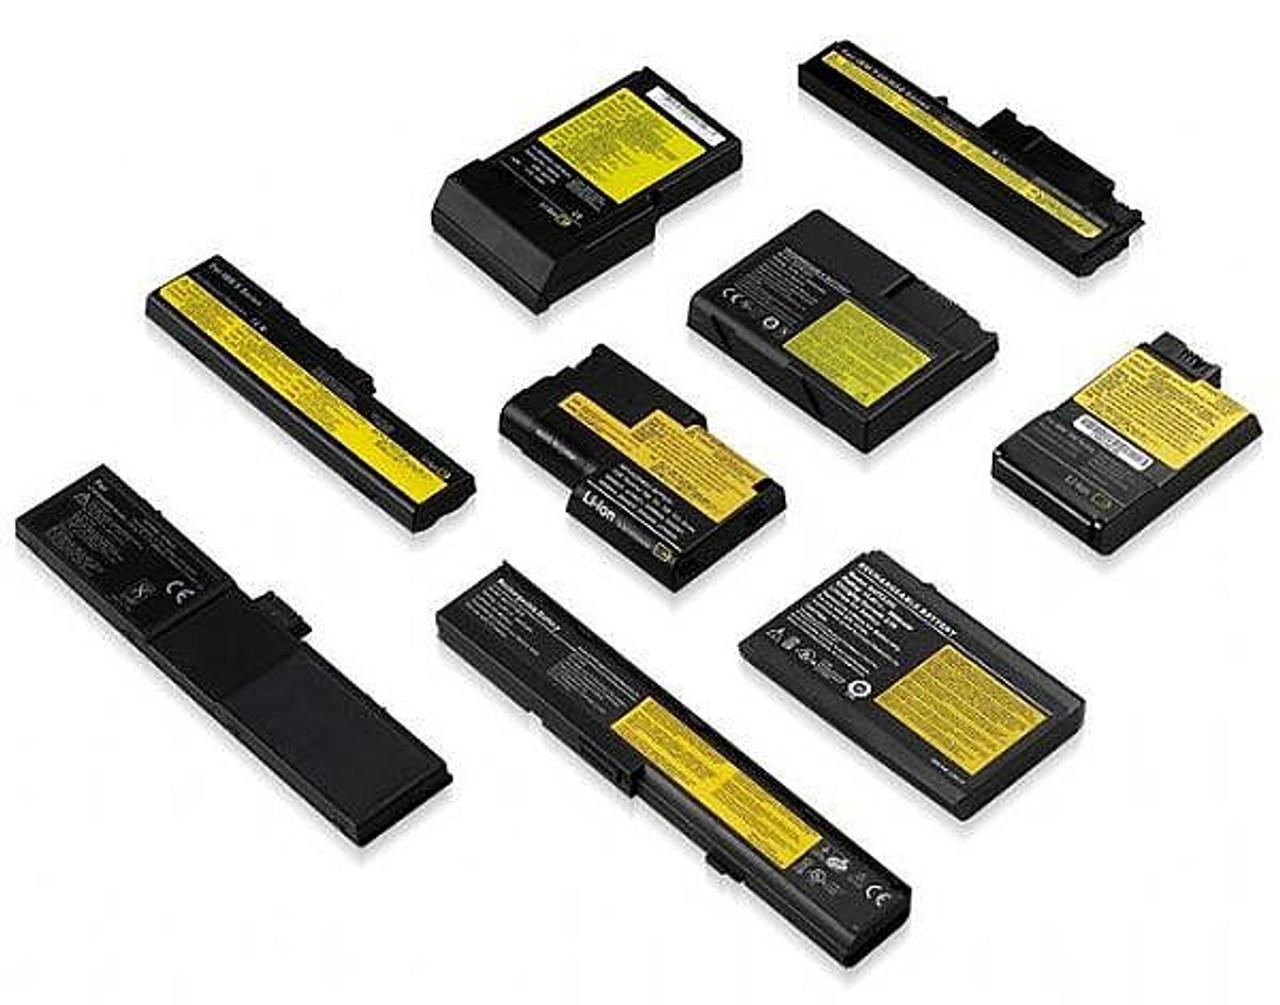 312-1325 - Dell 9-Cell 97-WHr Lithium-Ion Battery for Latitude E5430,  E5530, E6430, E6430 ATG, E6530 Laptops